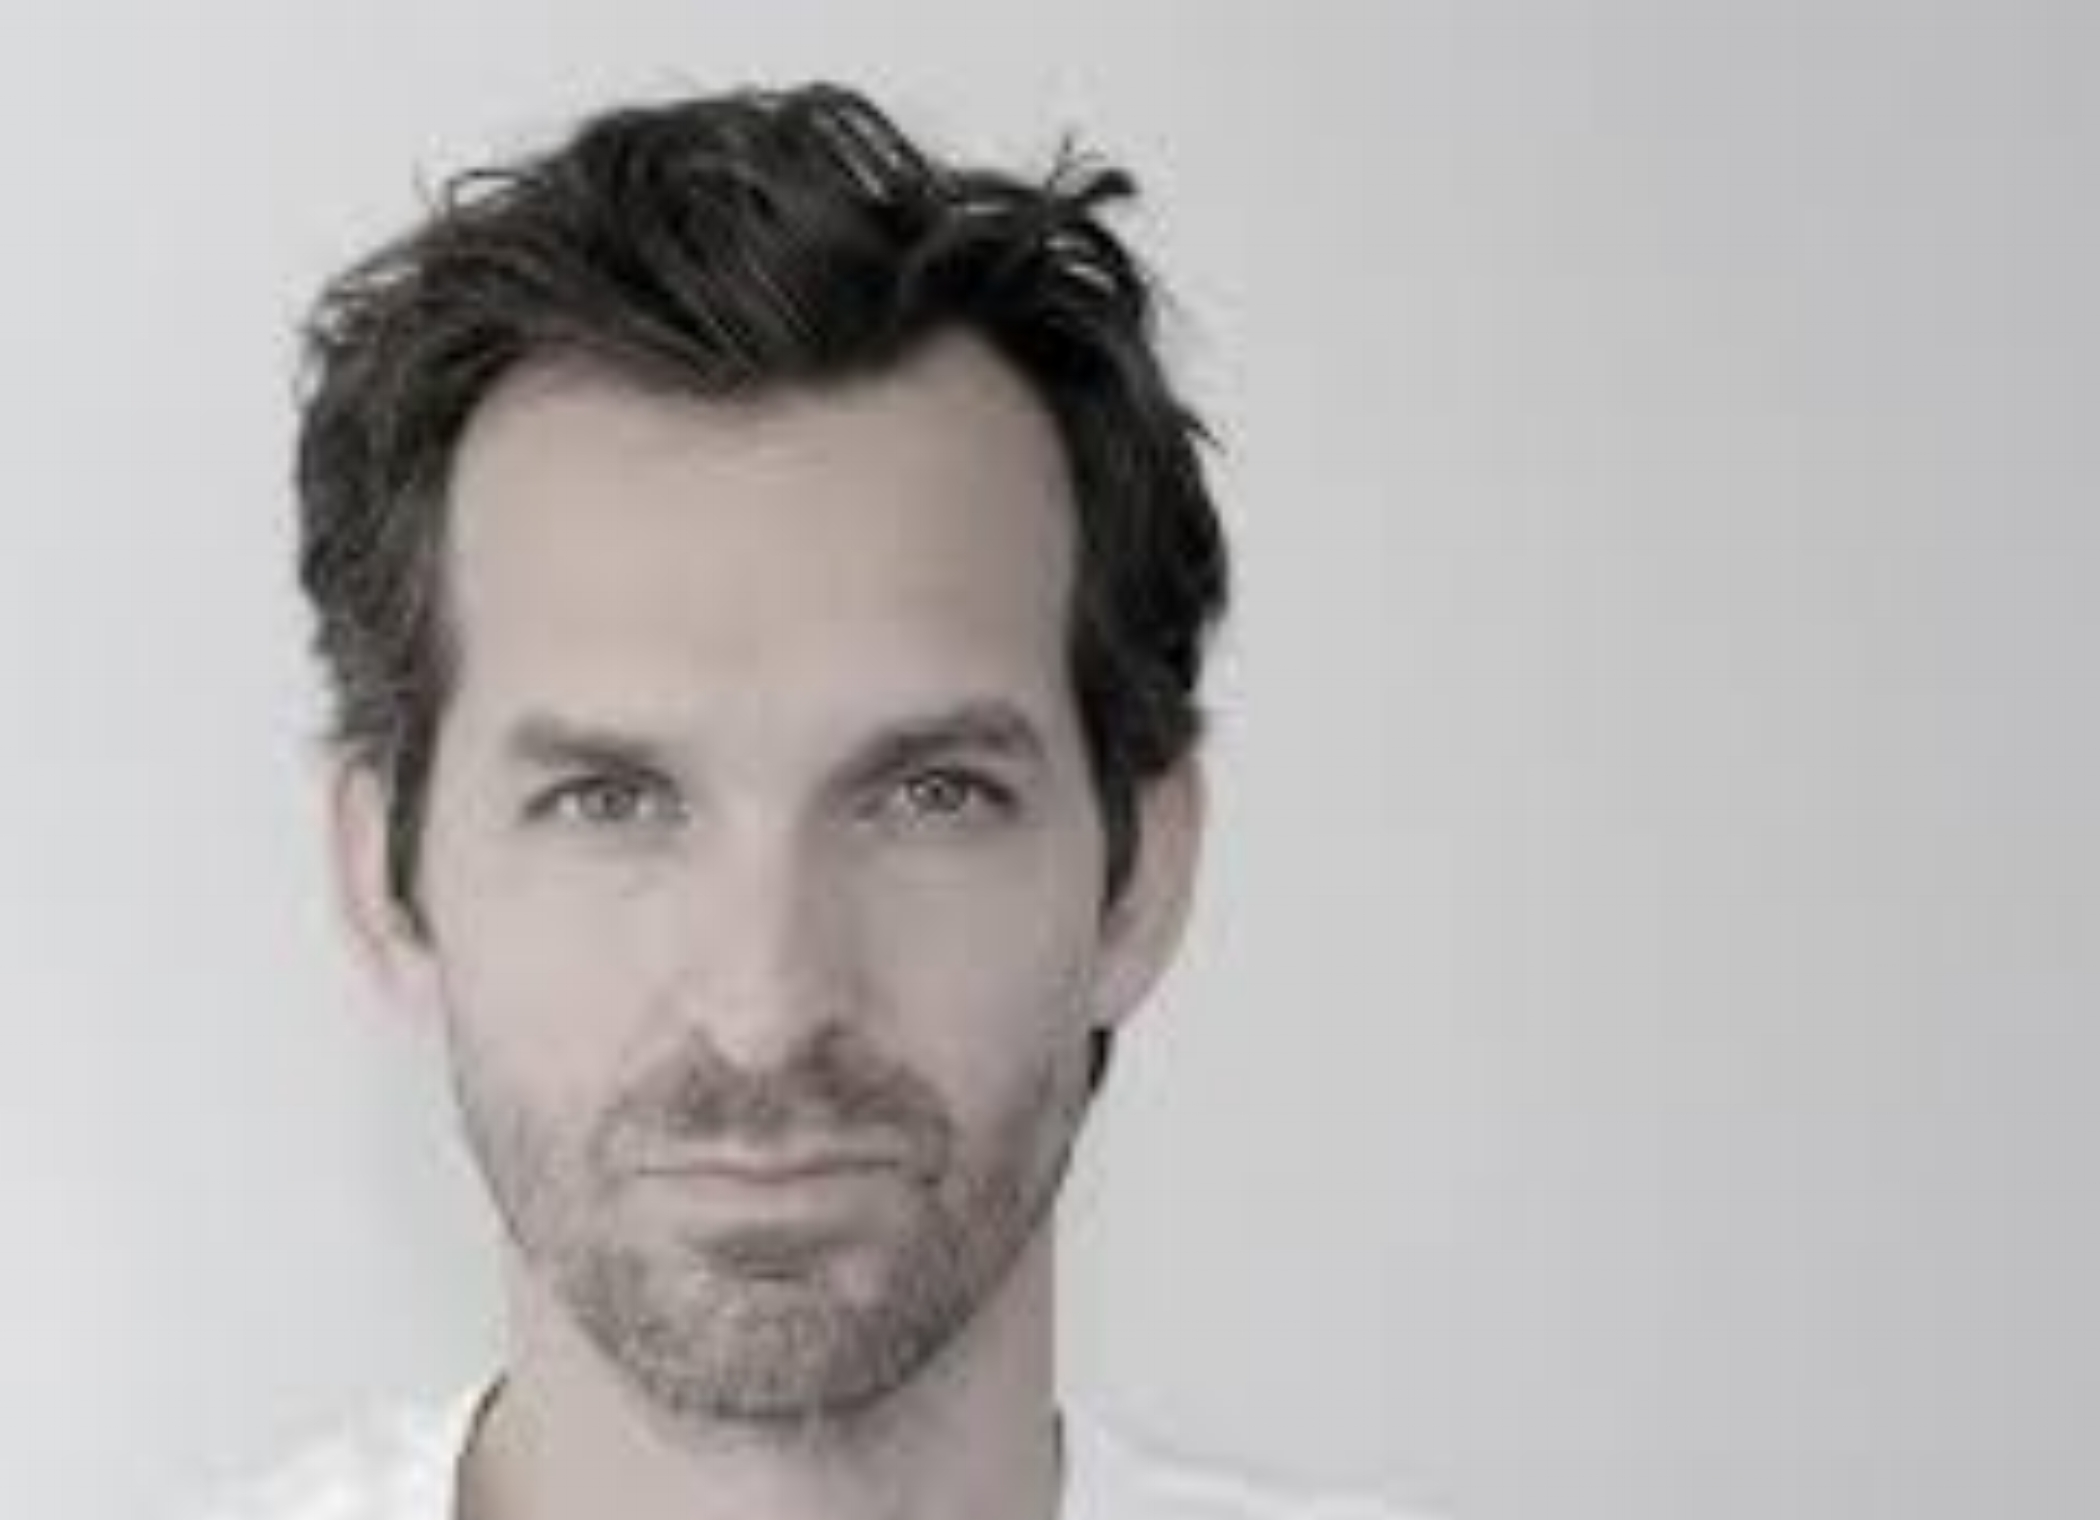 Mathieu Lehanneur  - Design  Lehanneur combines design, science, art and technology as poetic- communicative components to achieve maximum welfare for human beings.